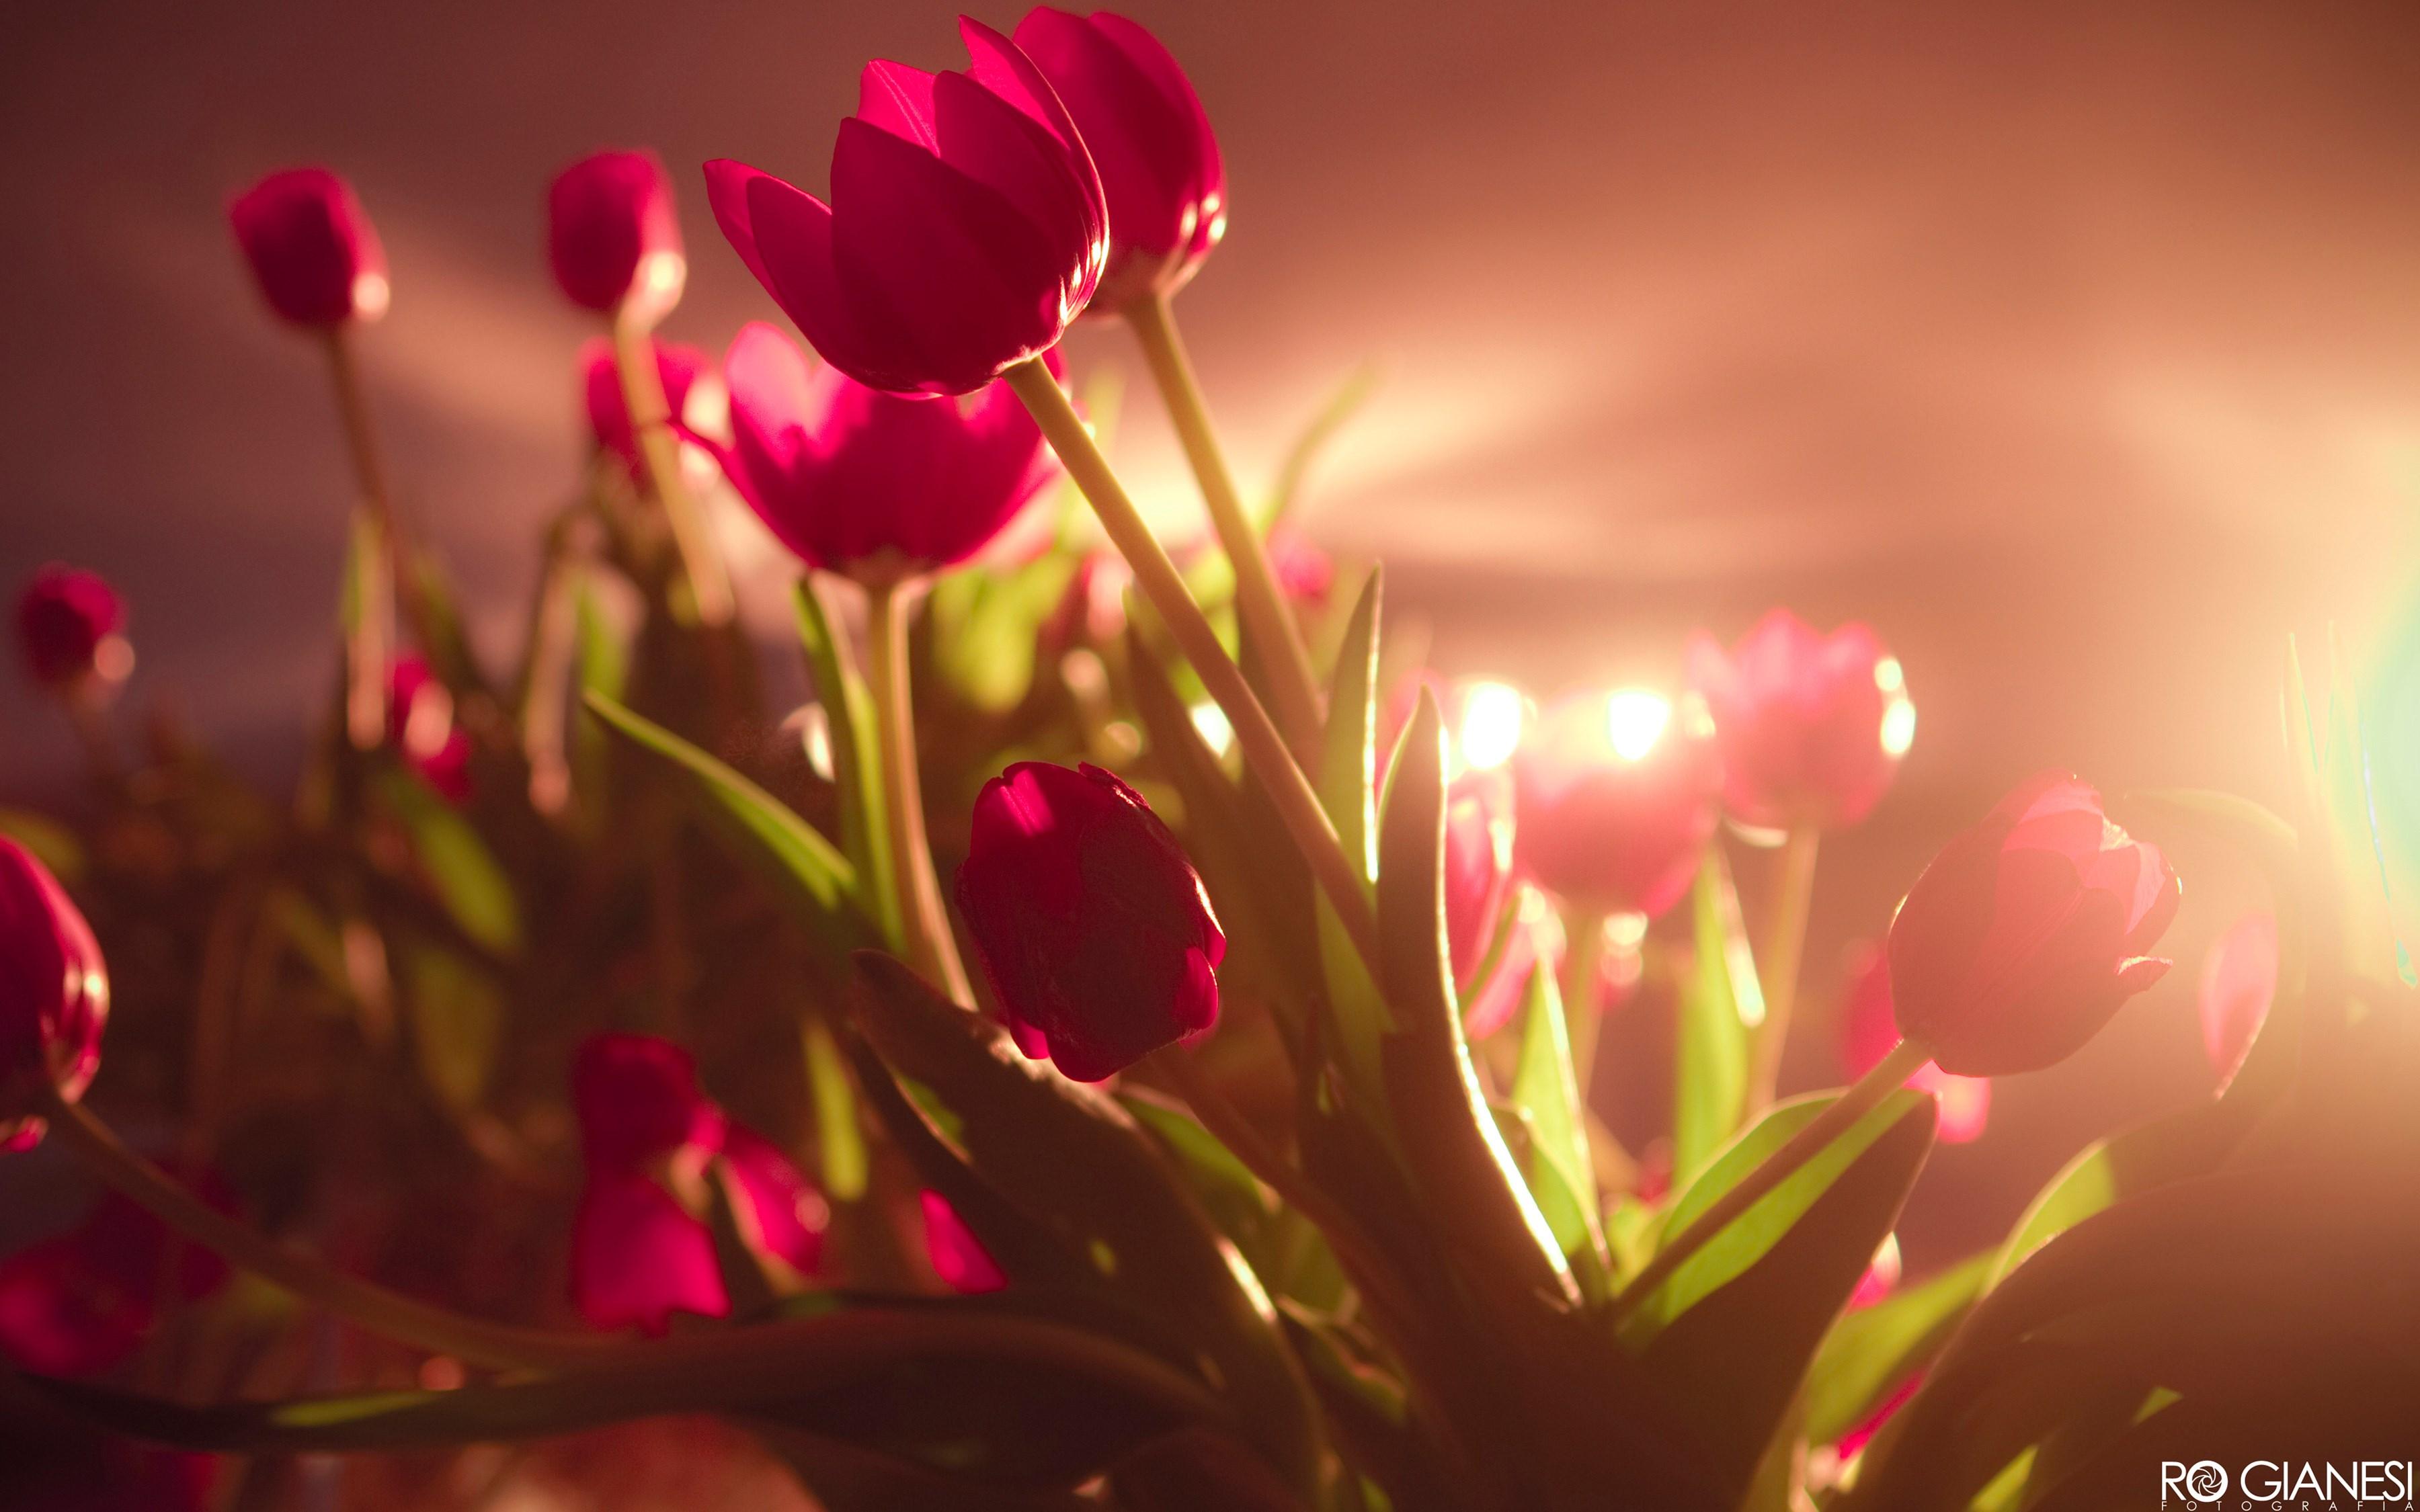 Vibrant Red Tulips Wallpaper 3600x2250